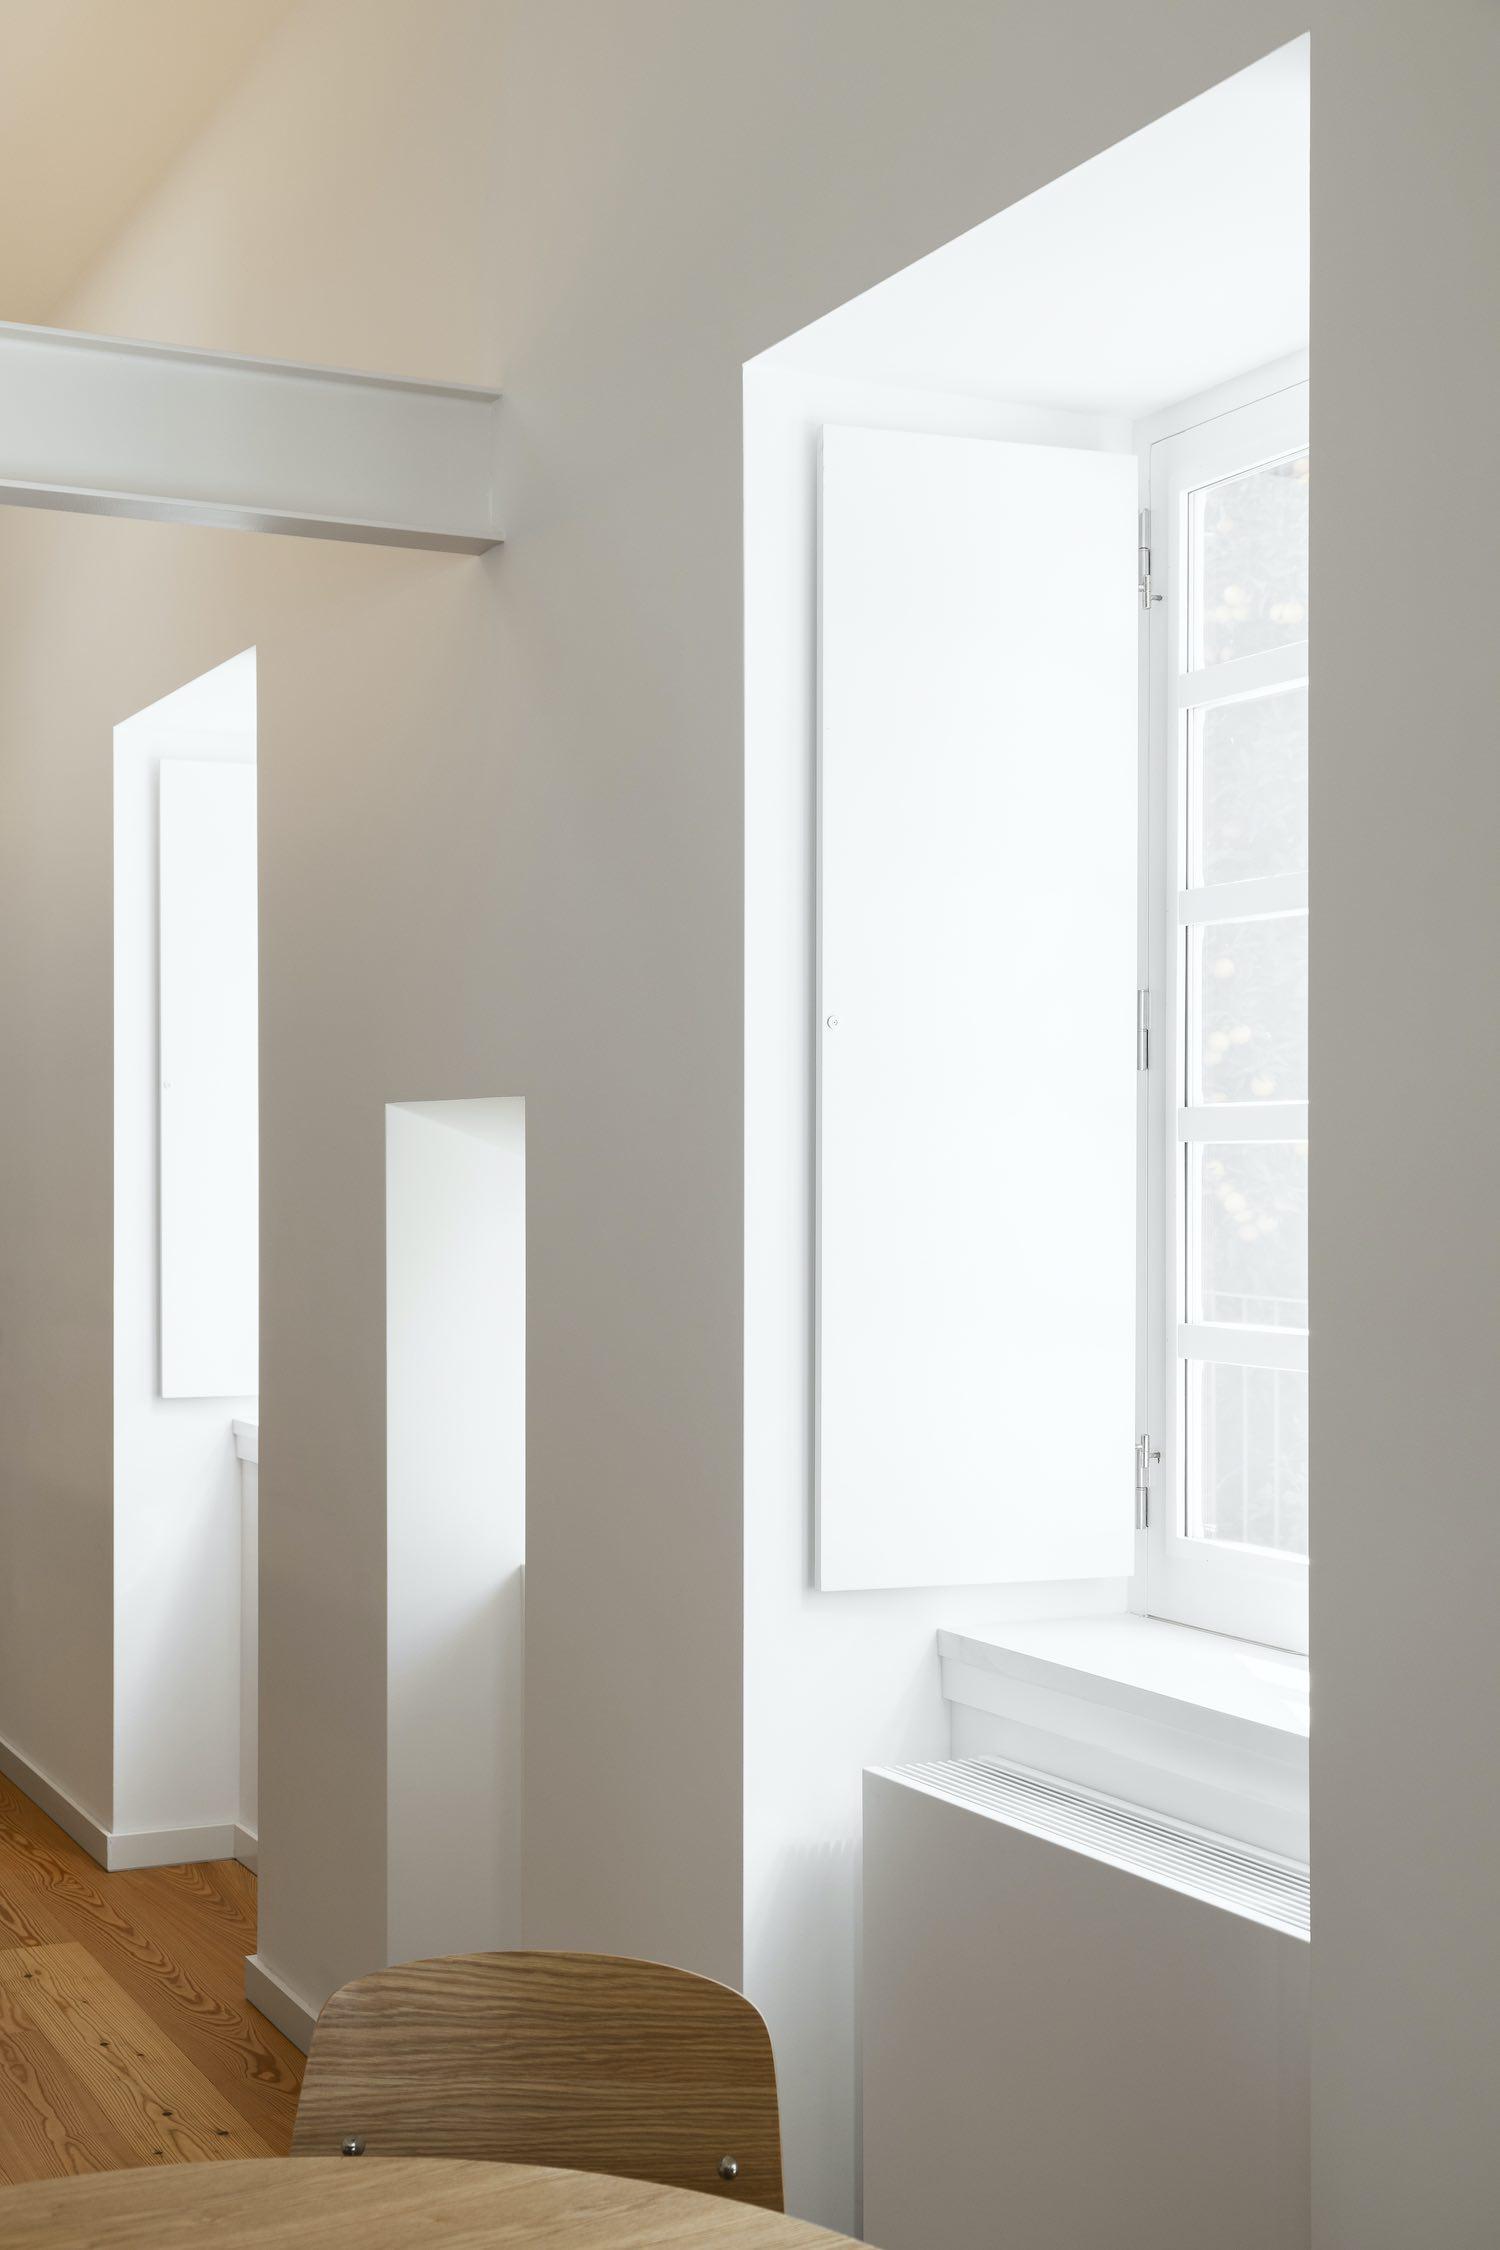 sunlight enters the room through window